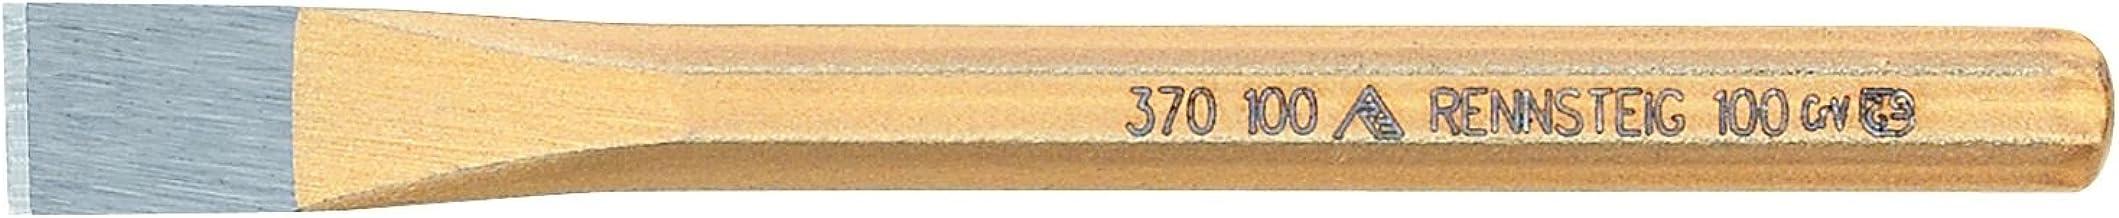 Flat Tile Chisel 125 mm